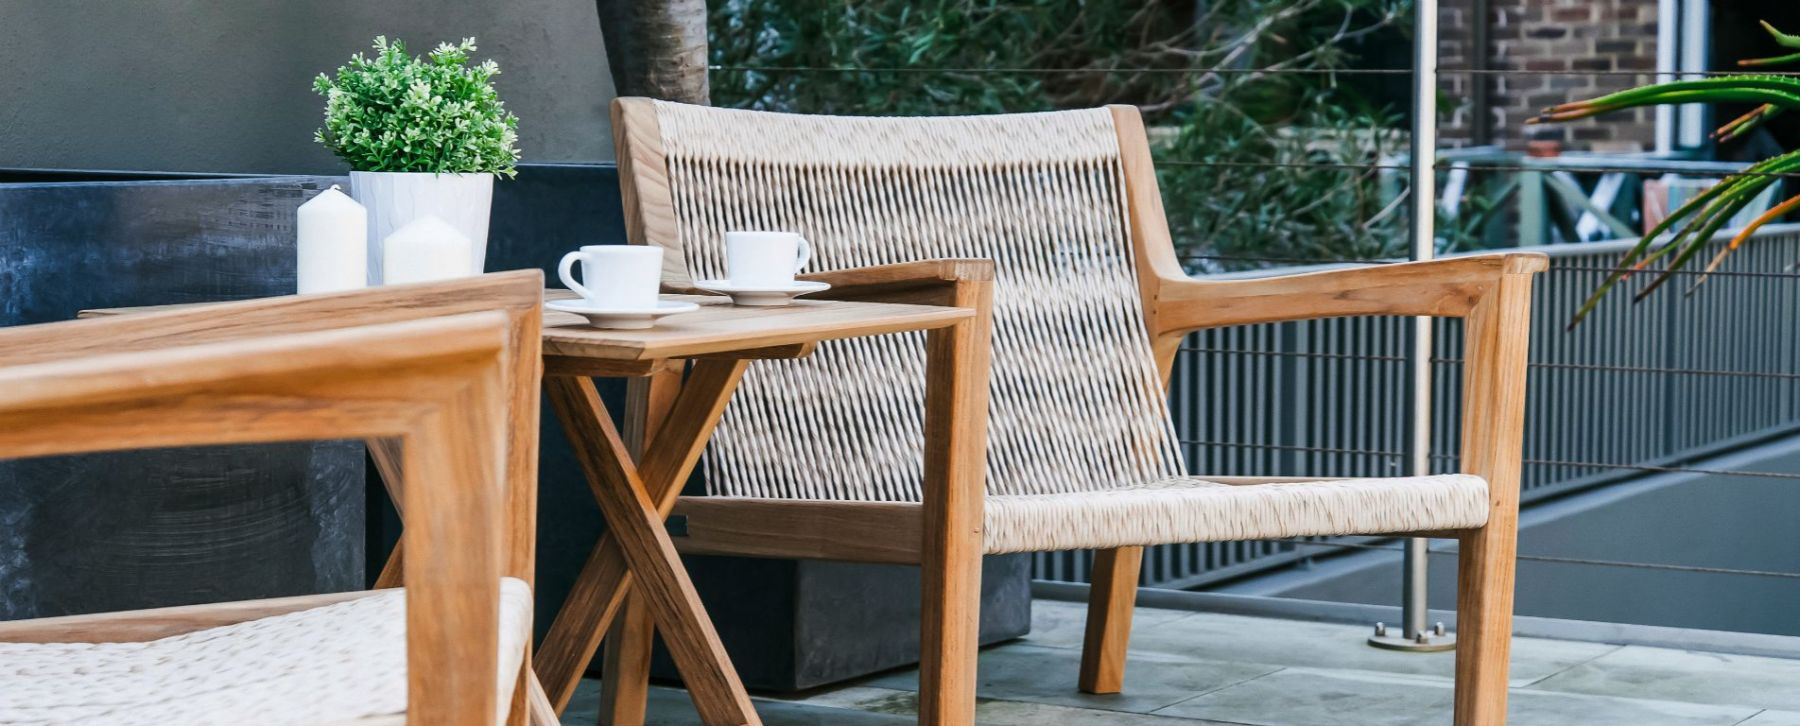 Avar club chairs rocker modern teak rope pool furniture hotels florida